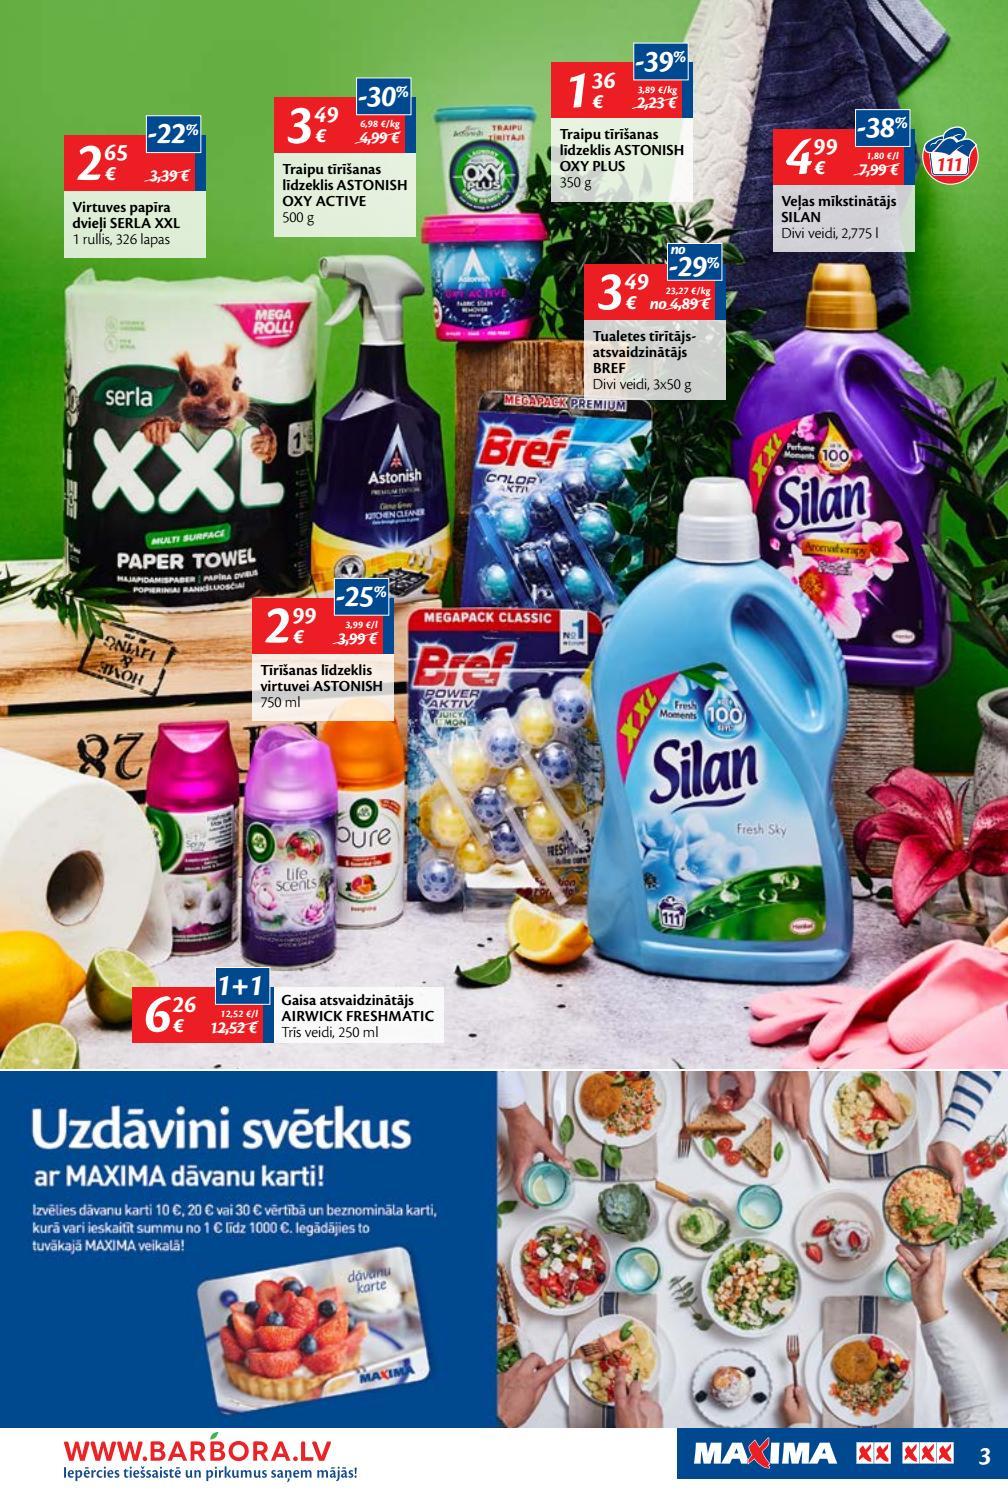 MAXIMA XX XXX akciju buklets 14.03.2019 - 27.03.2019